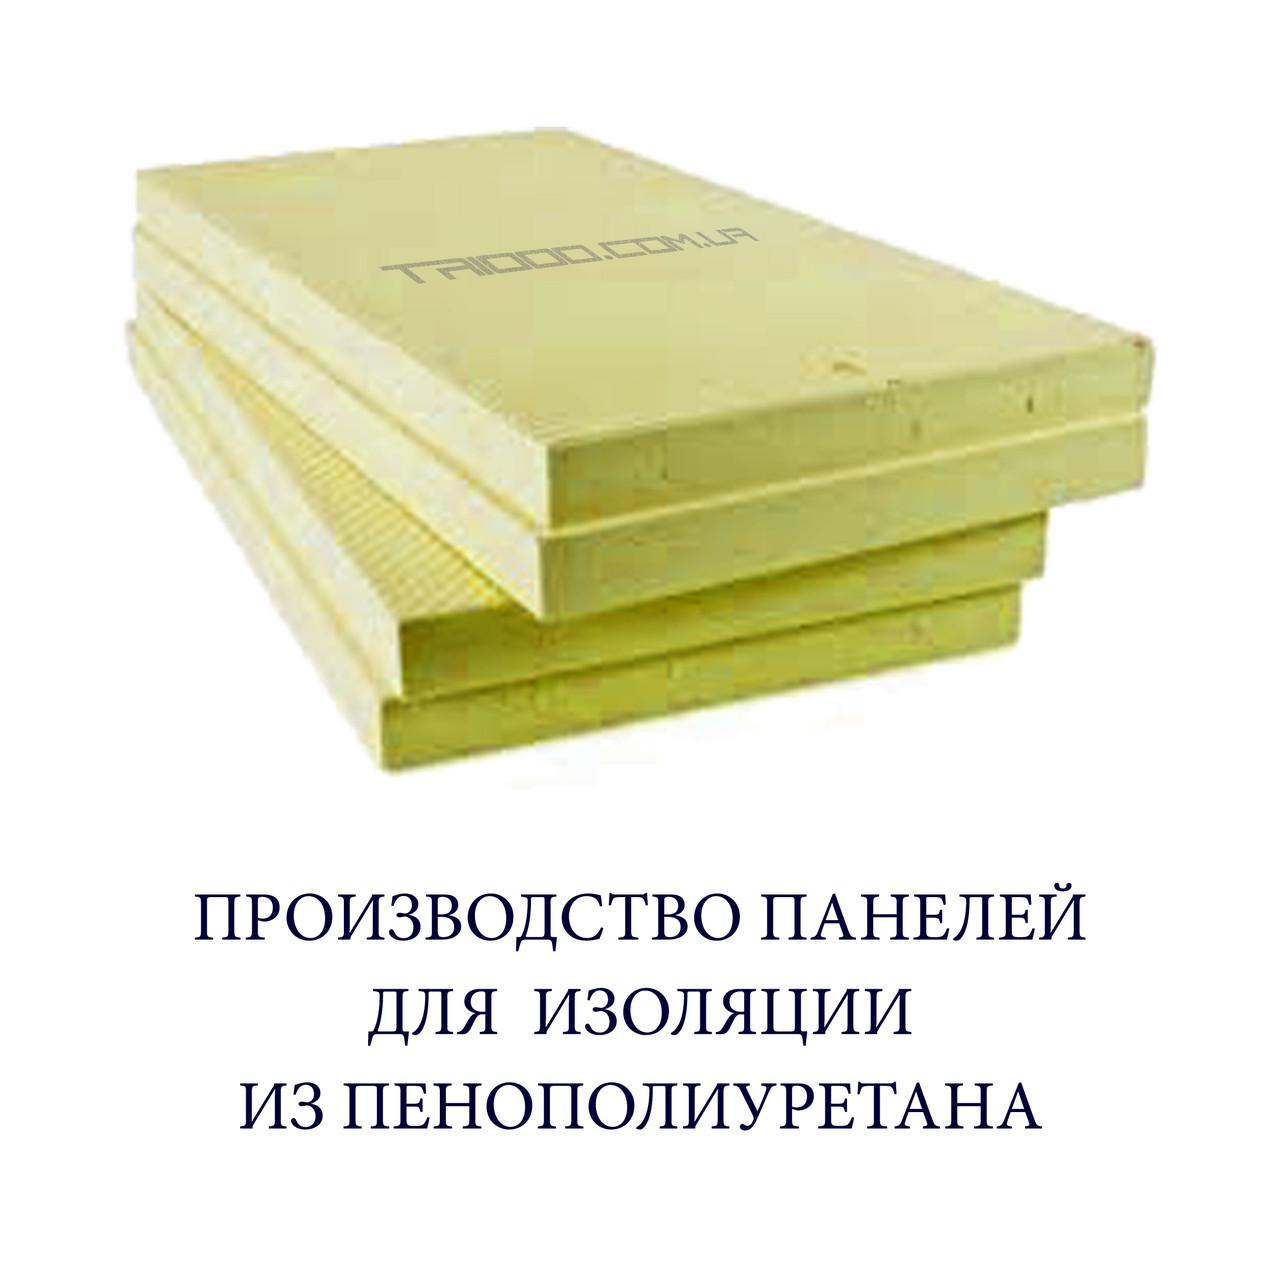 Плита пінополіуретанова (панель ППУ) 900 х 600 х 100 мм